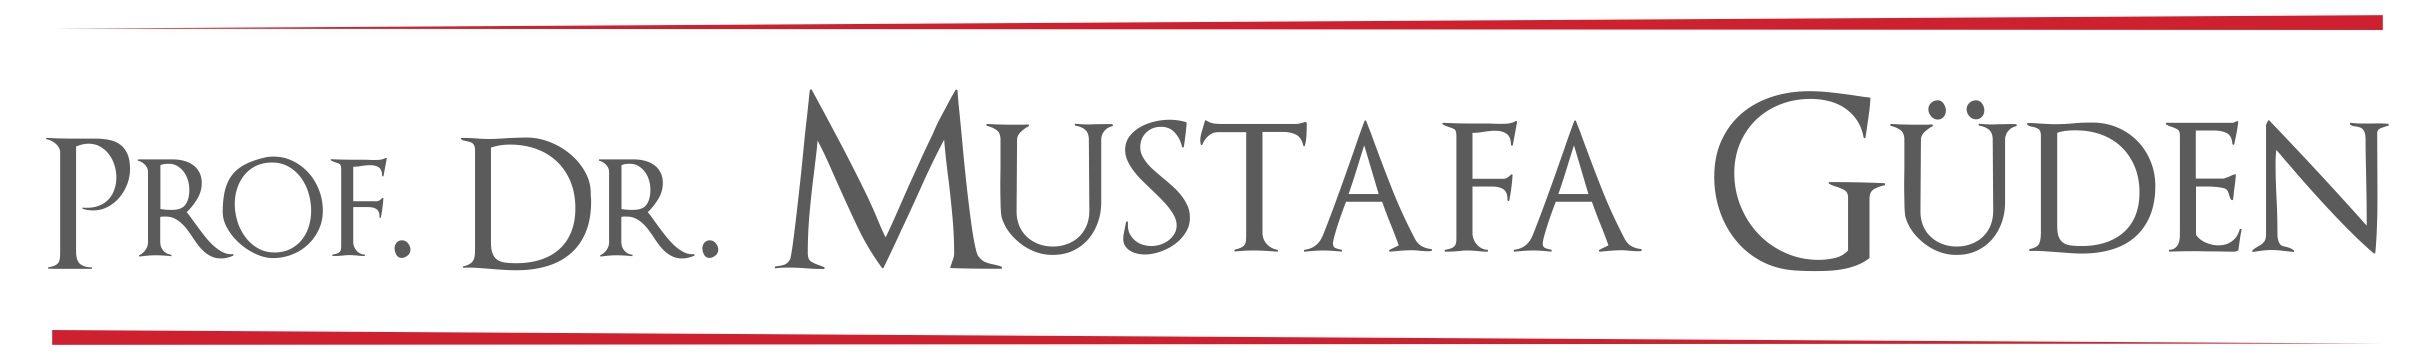 cropped-Prof.-Dr.-Mustafa-Güden-Logo.jpg